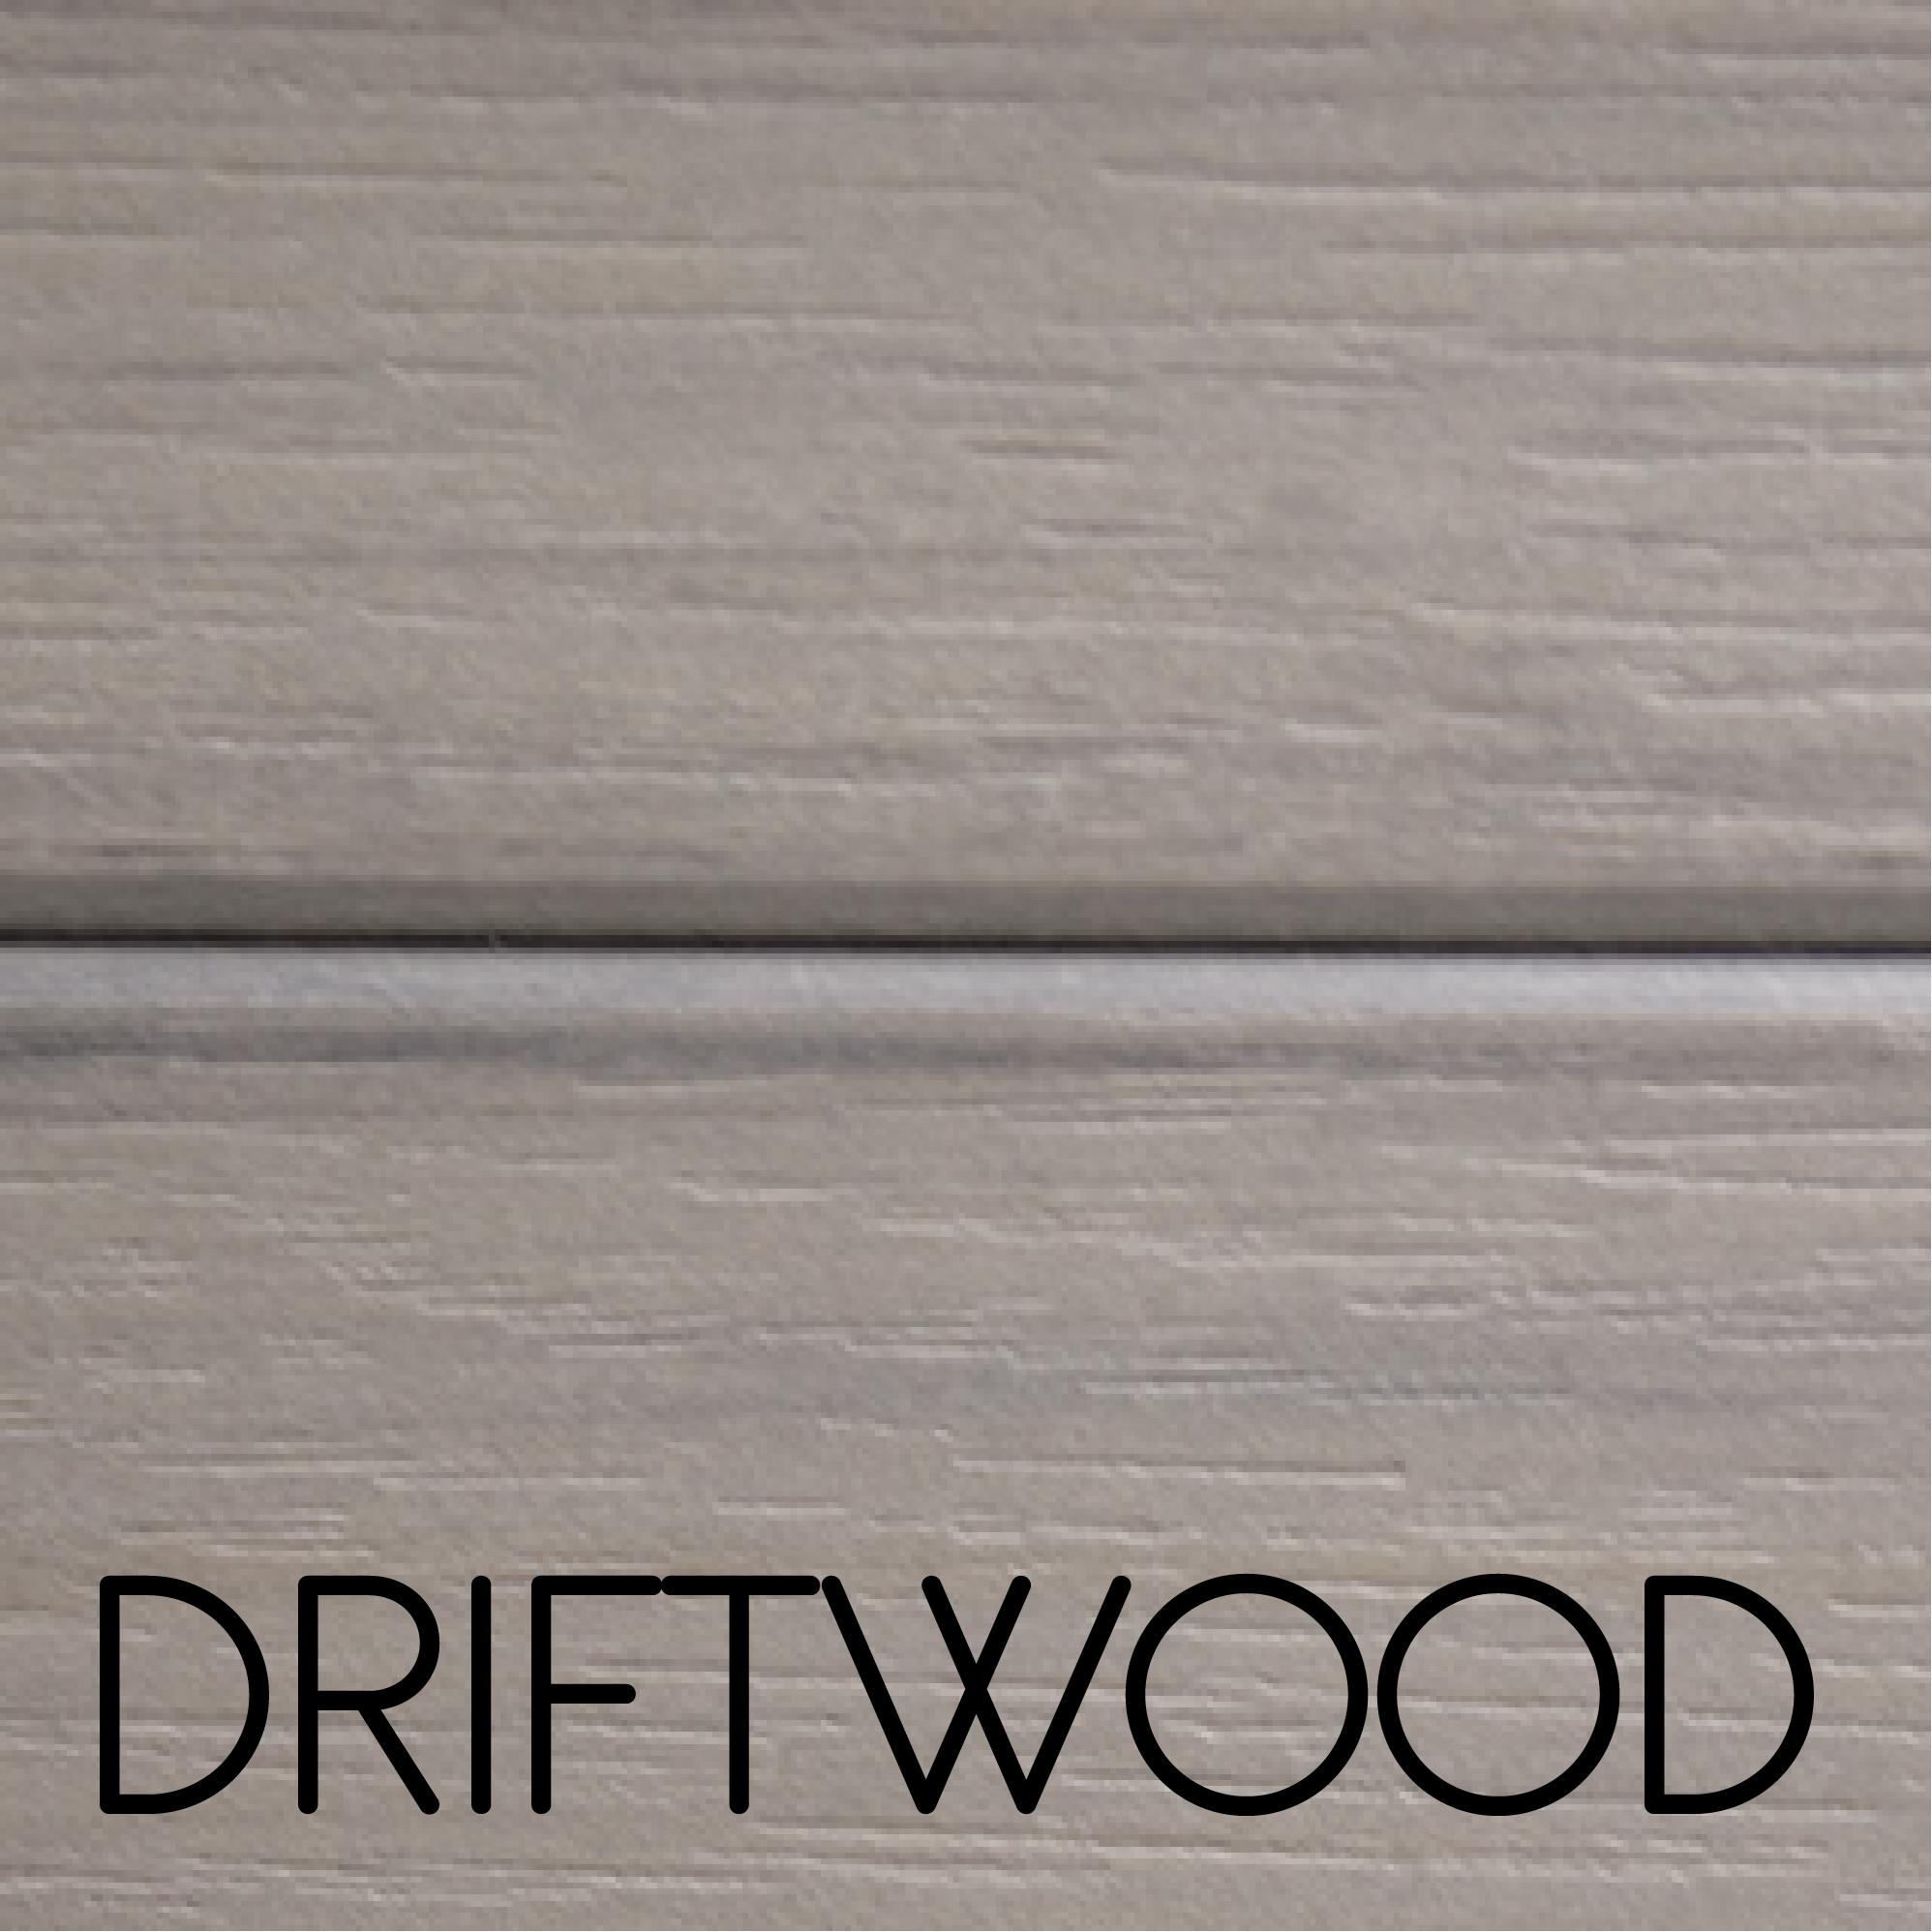 DRIFTWOOD-01.jpg